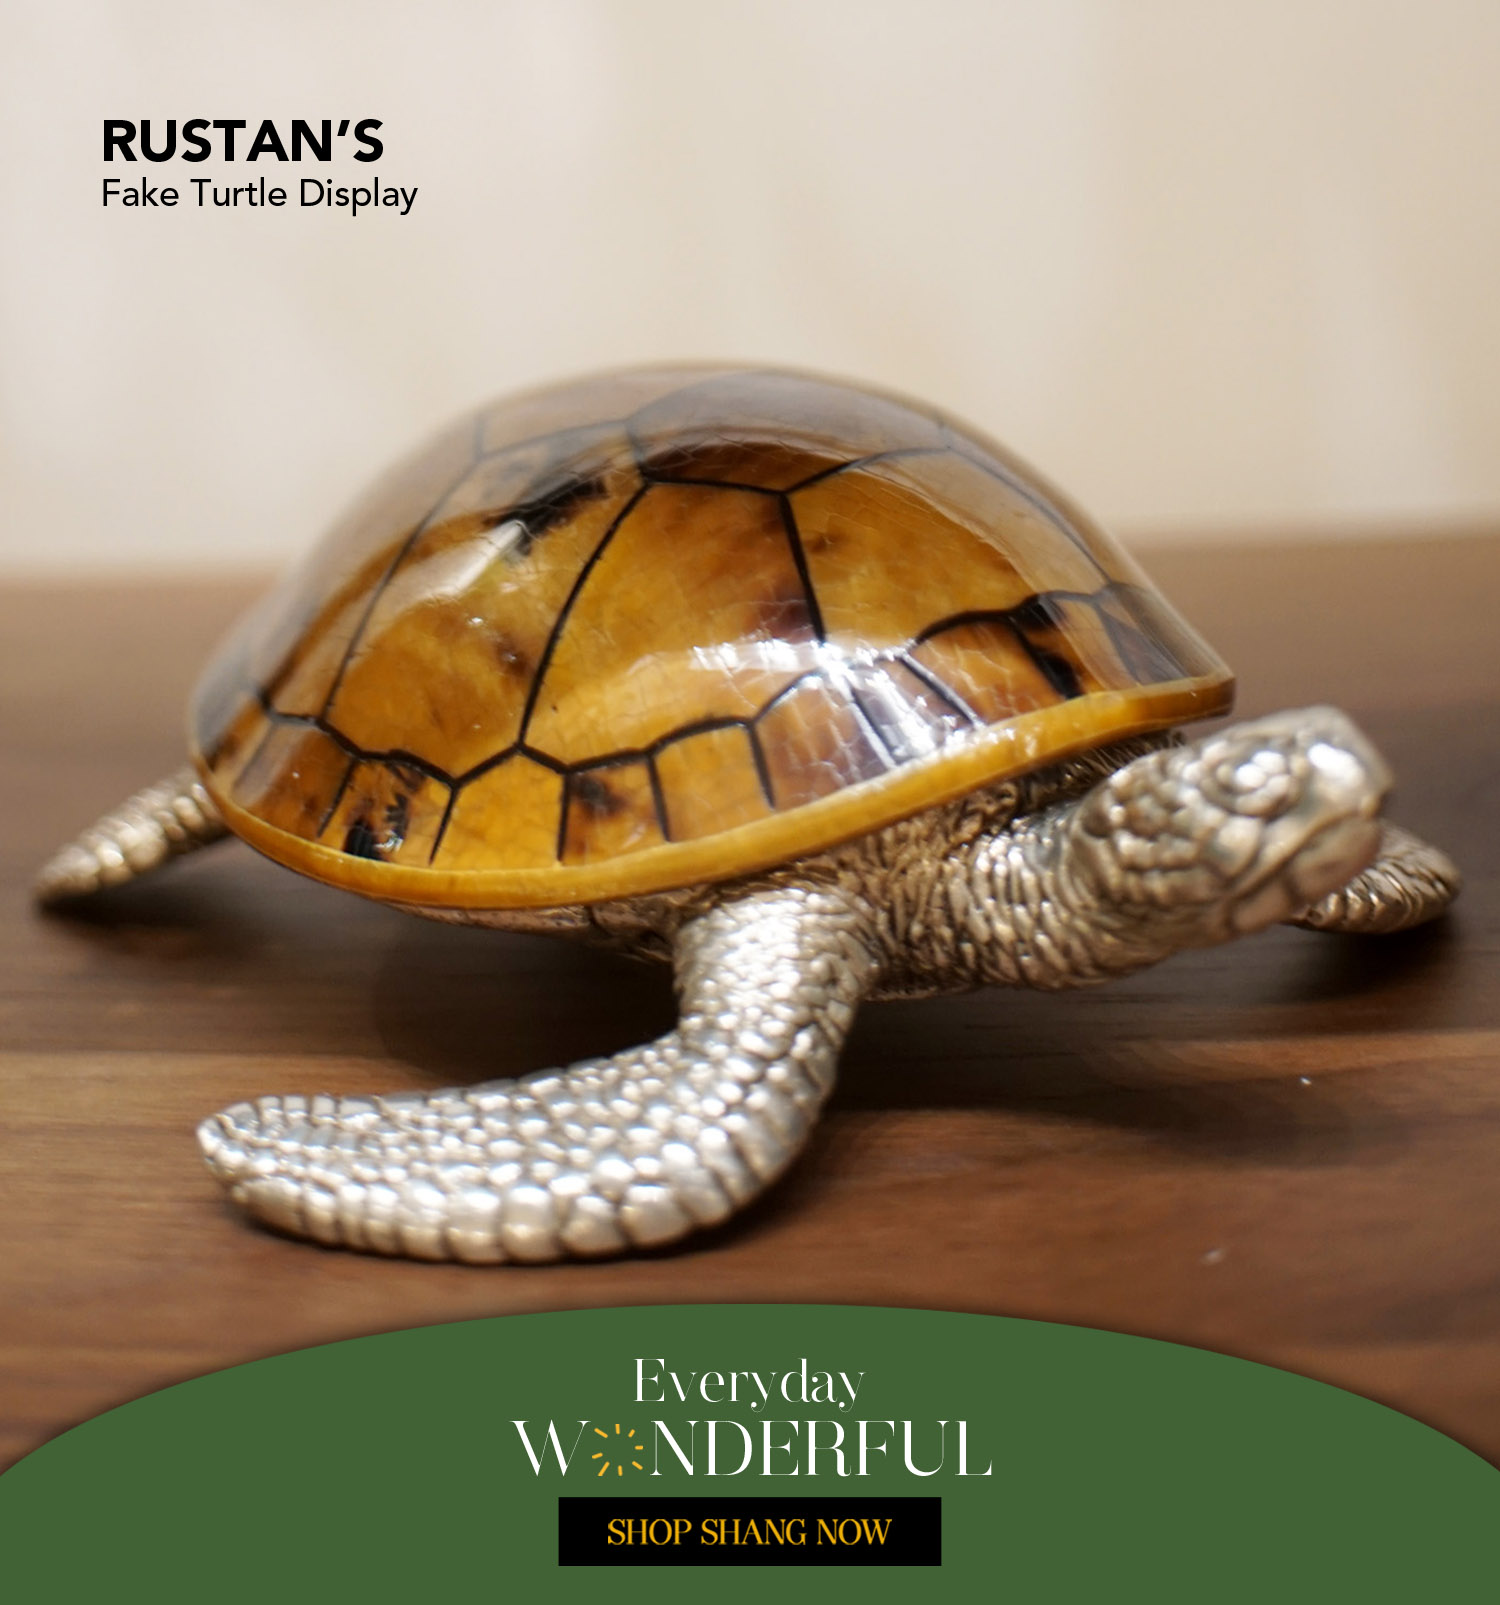 Fake Turtle Display from Rustan's